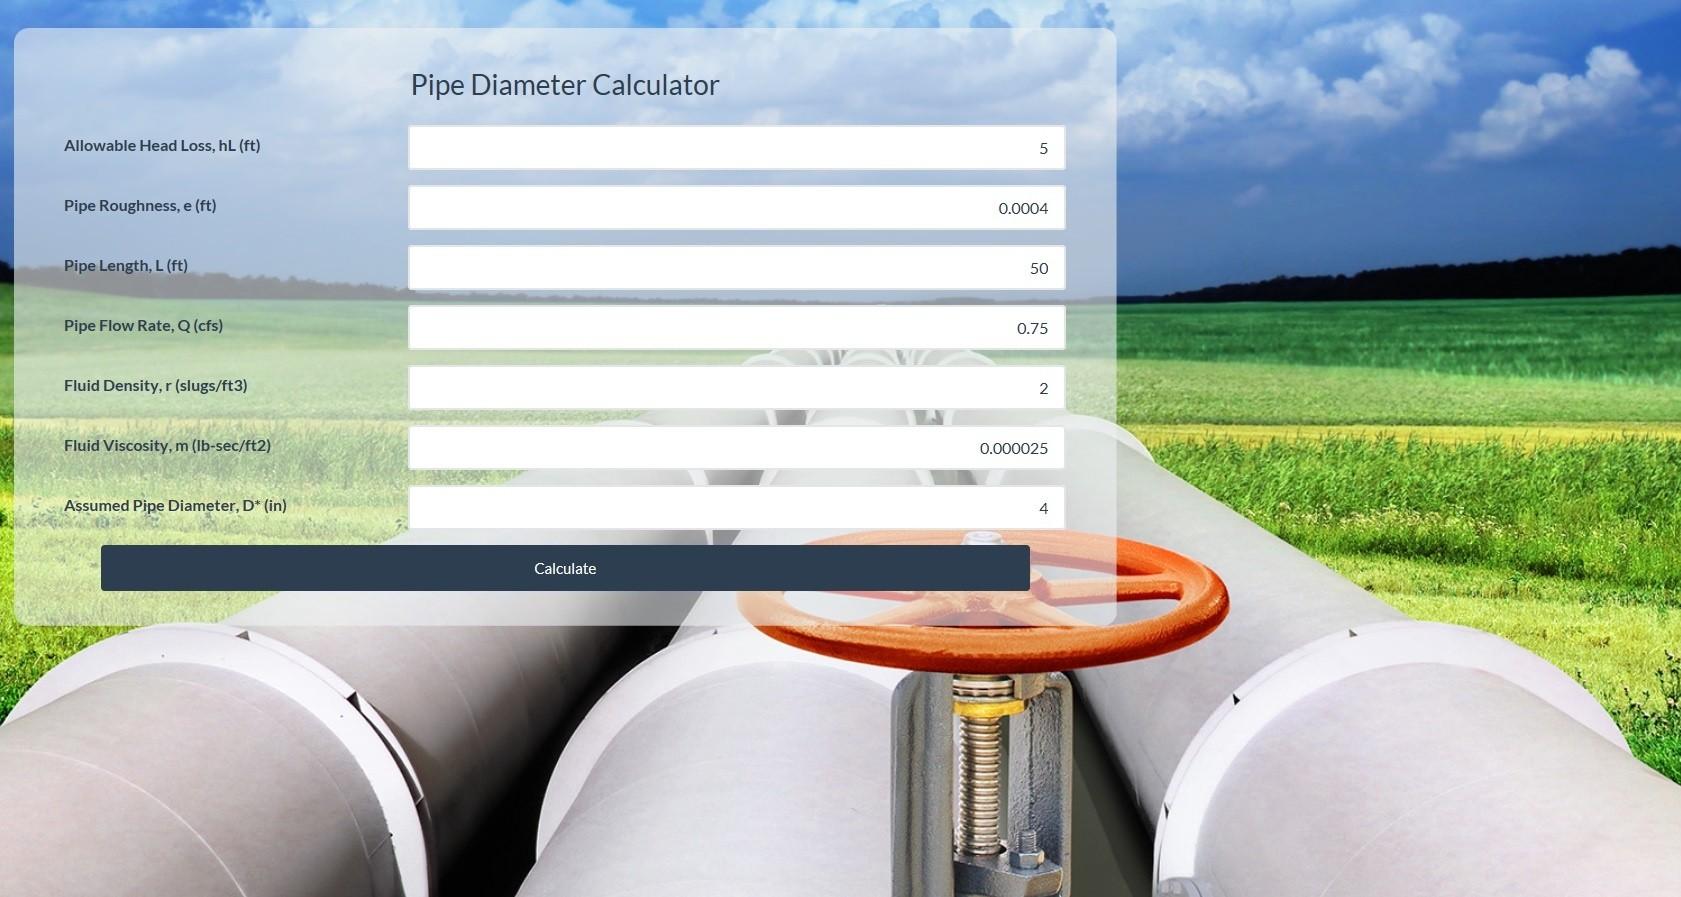 Pipe Diameter Calculator